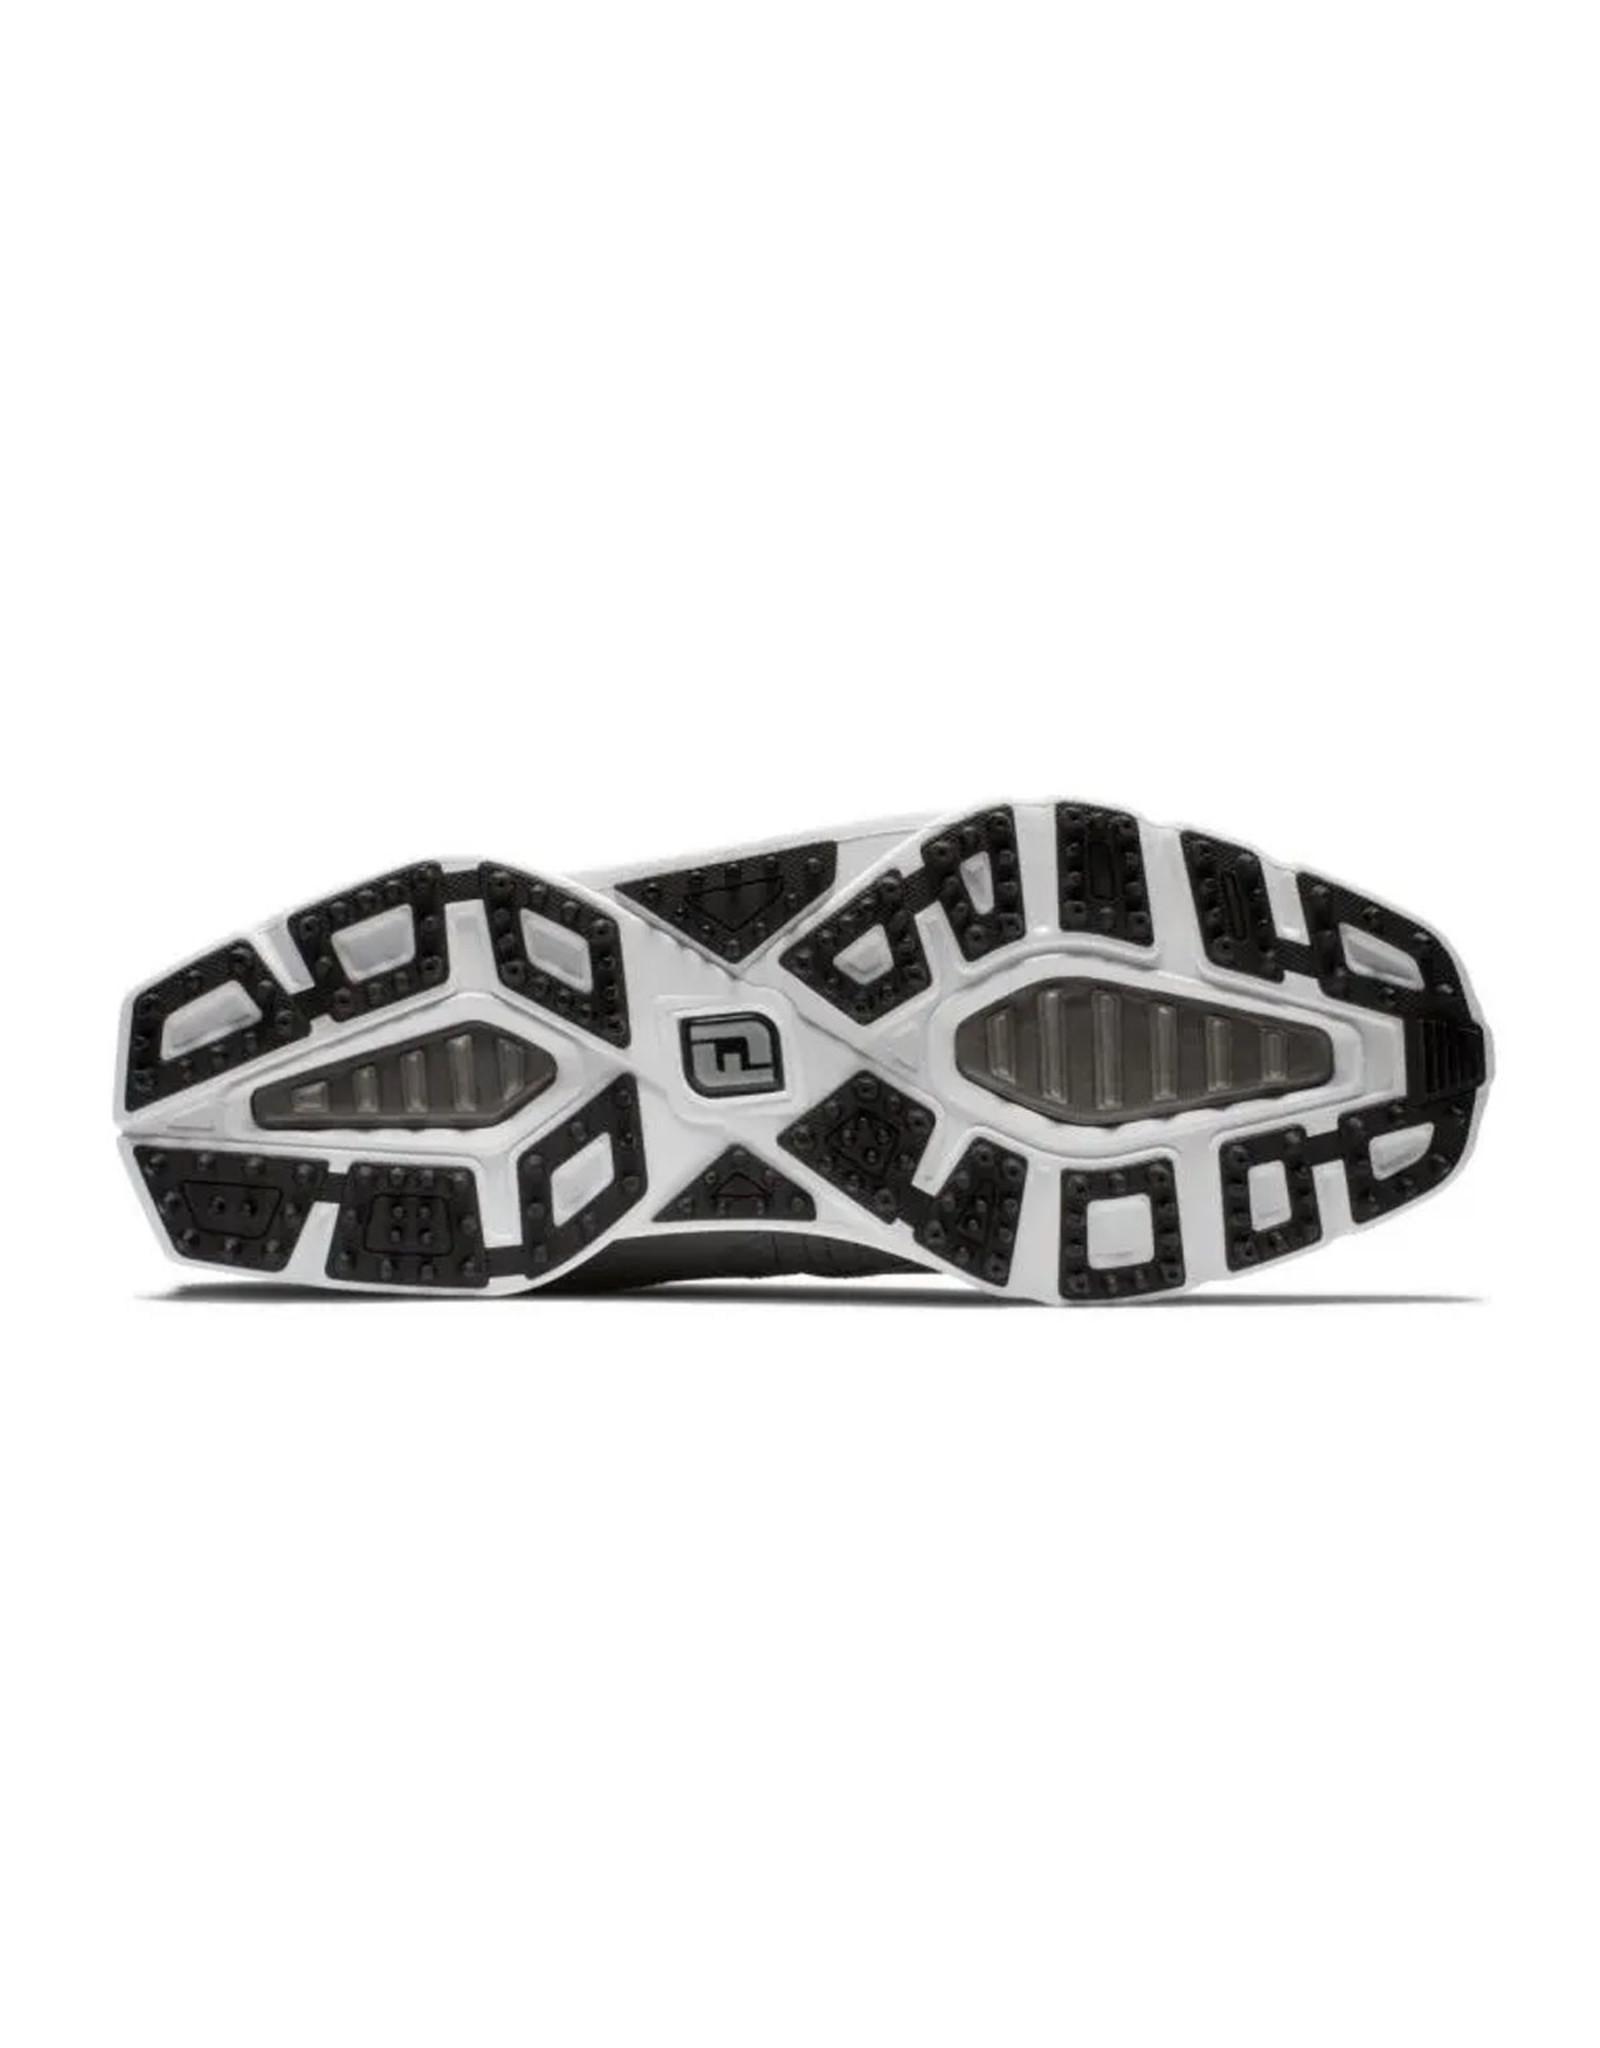 FootJoy FootJoy Pro SL Spikeless Grey